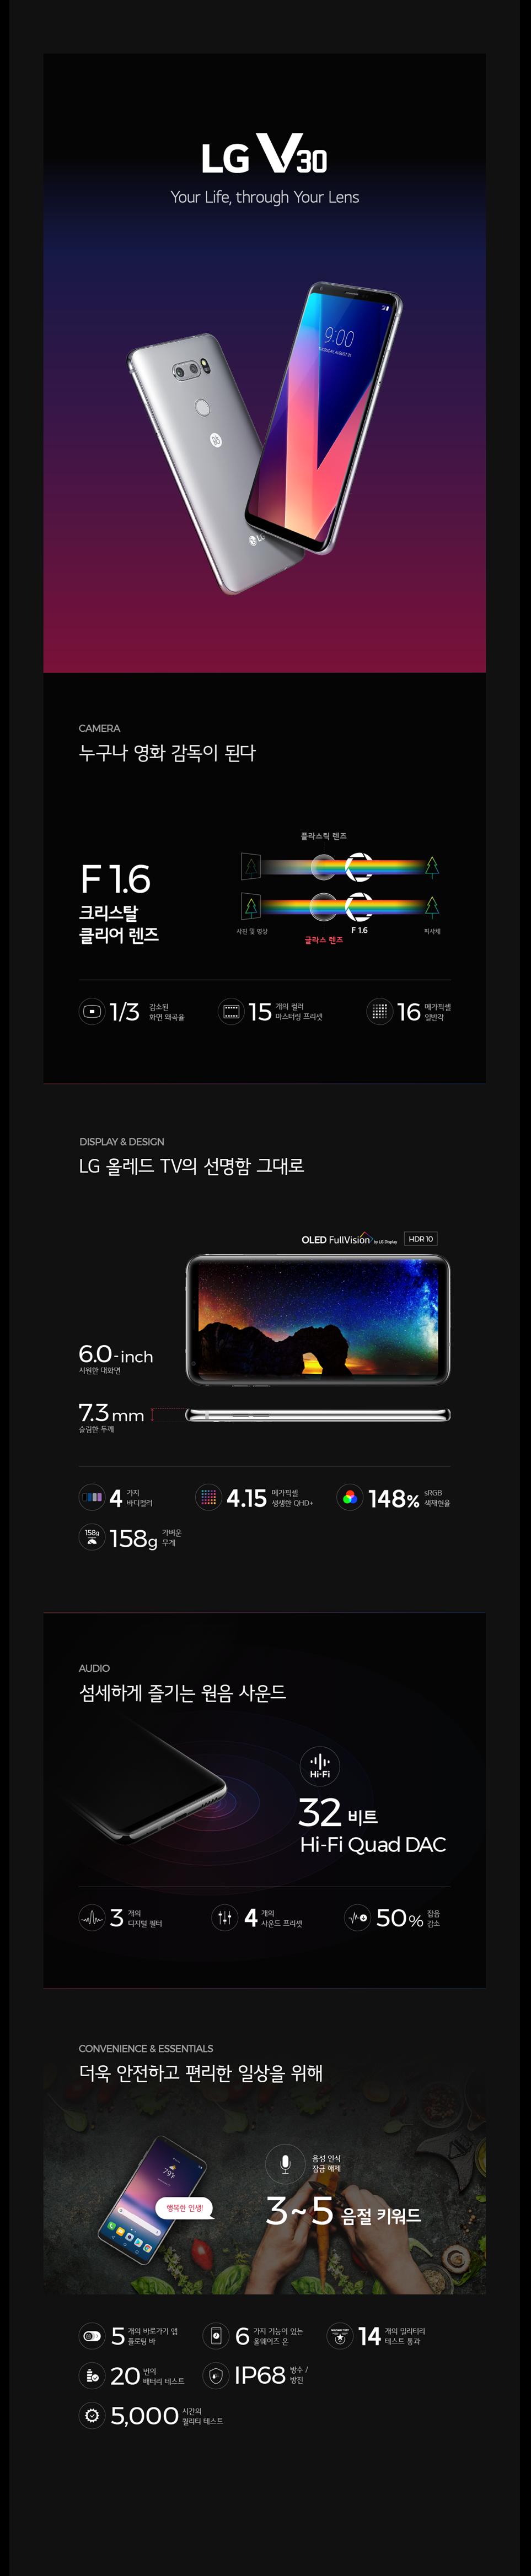 'LG V30' 인포그래픽